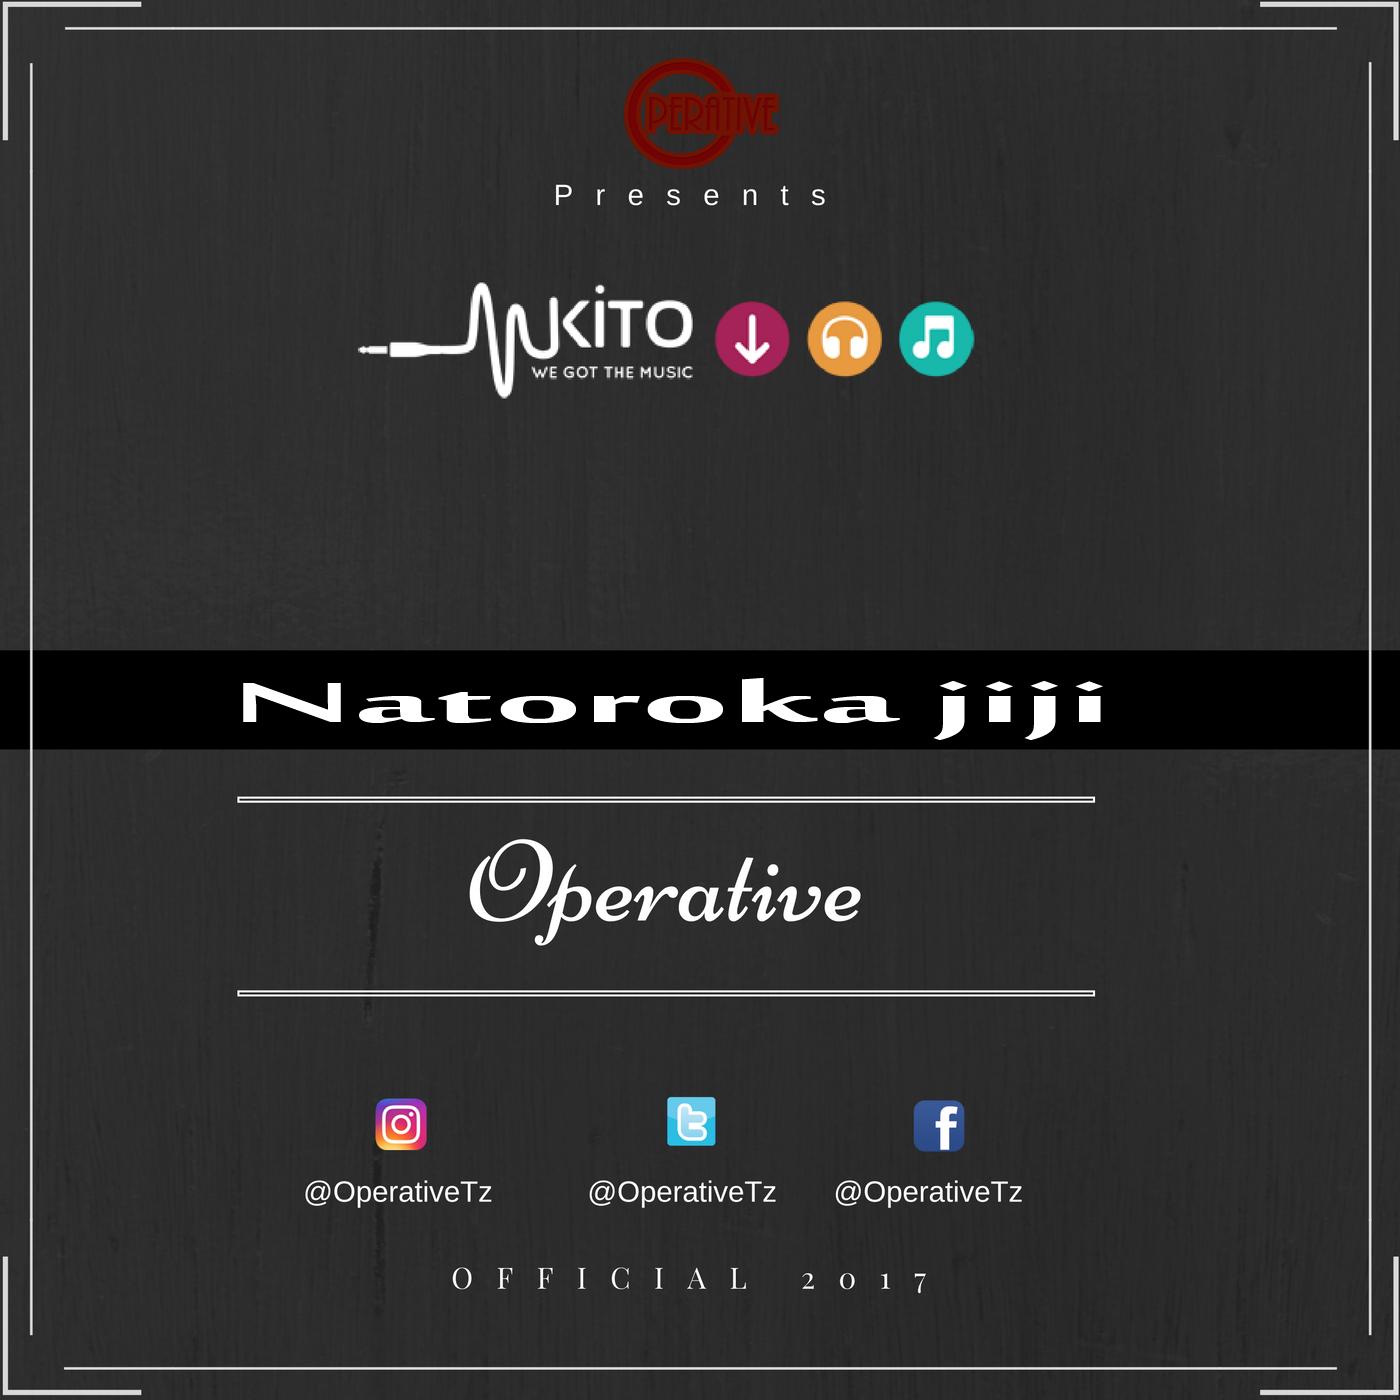 Operative - Kibega dance